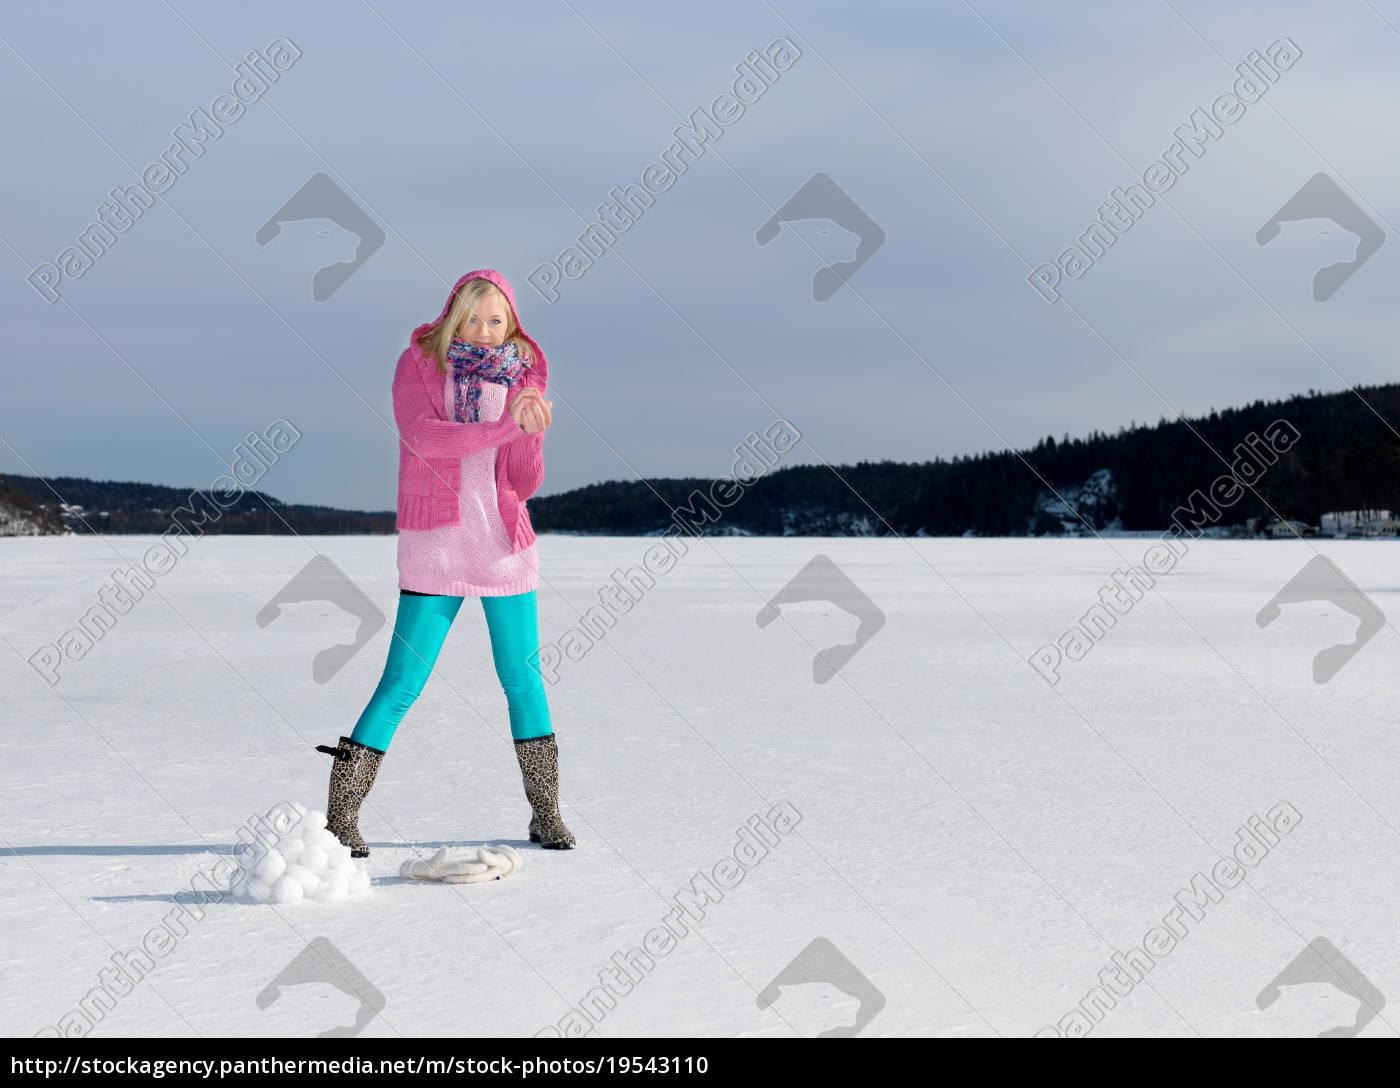 girl, making, a, snow, ball - 19543110